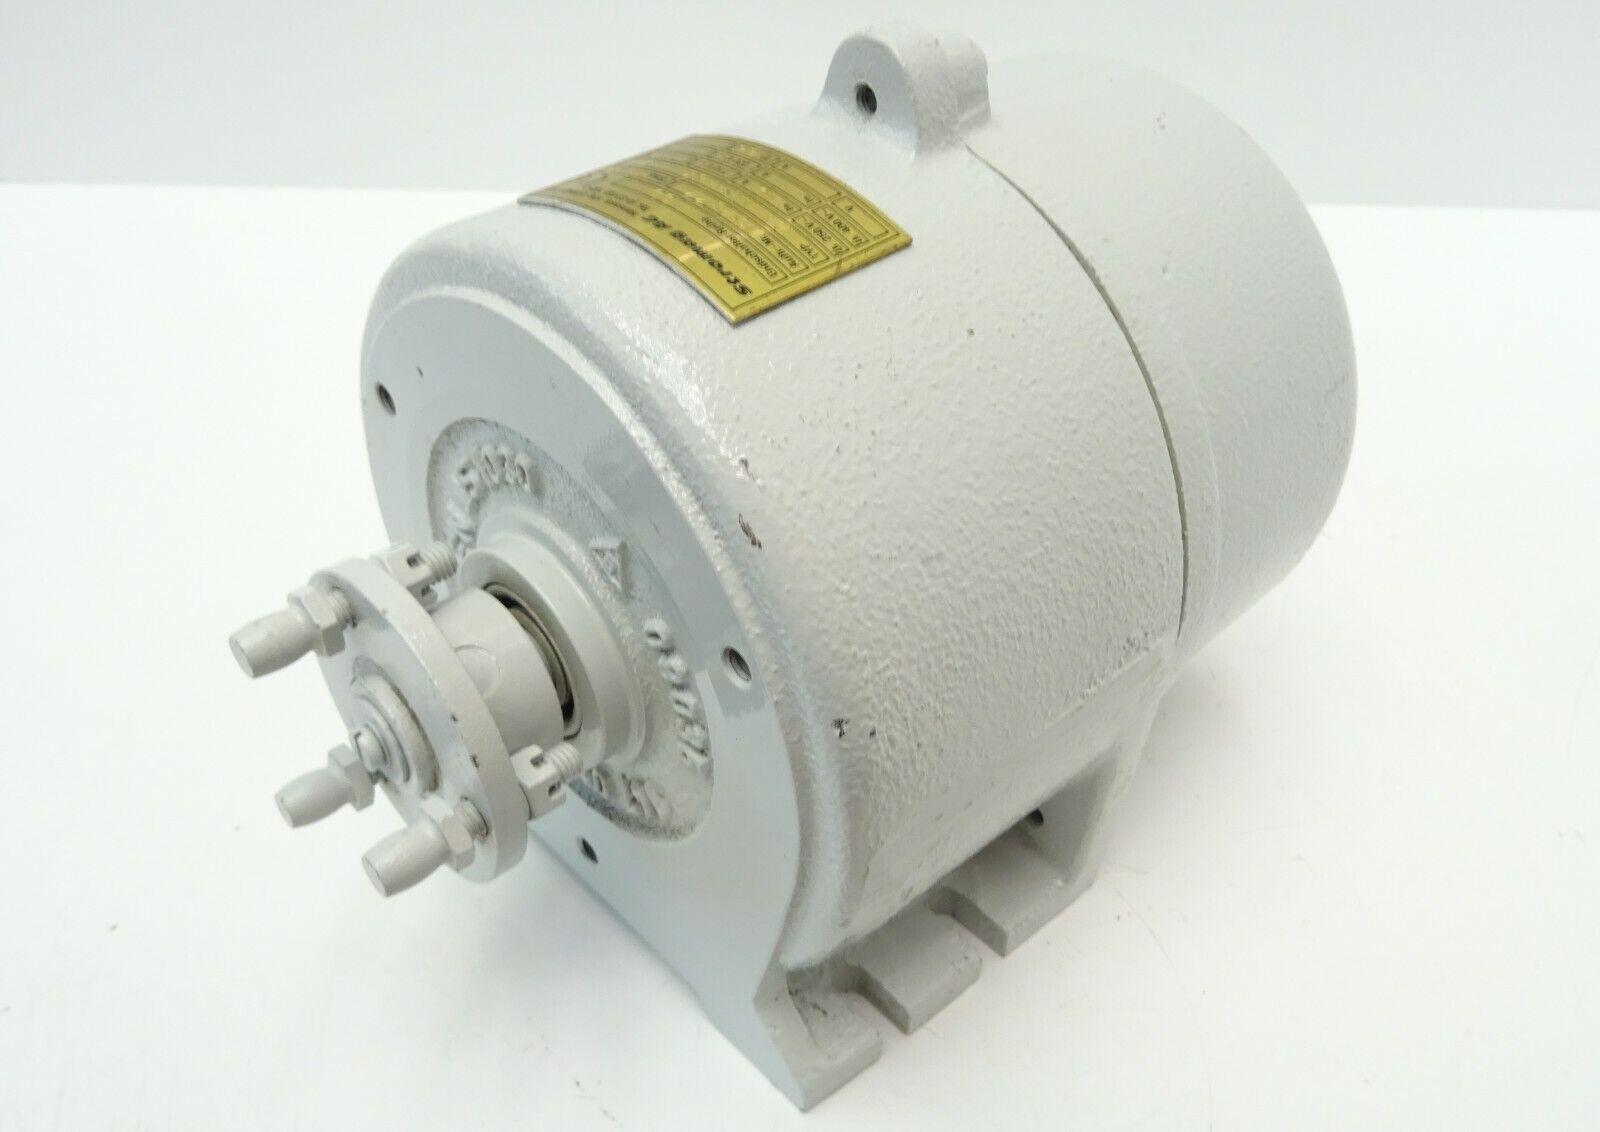 Spur Gear Limit Switch Stromag Series 21 Type 21 NE 21 FV limit switch B21